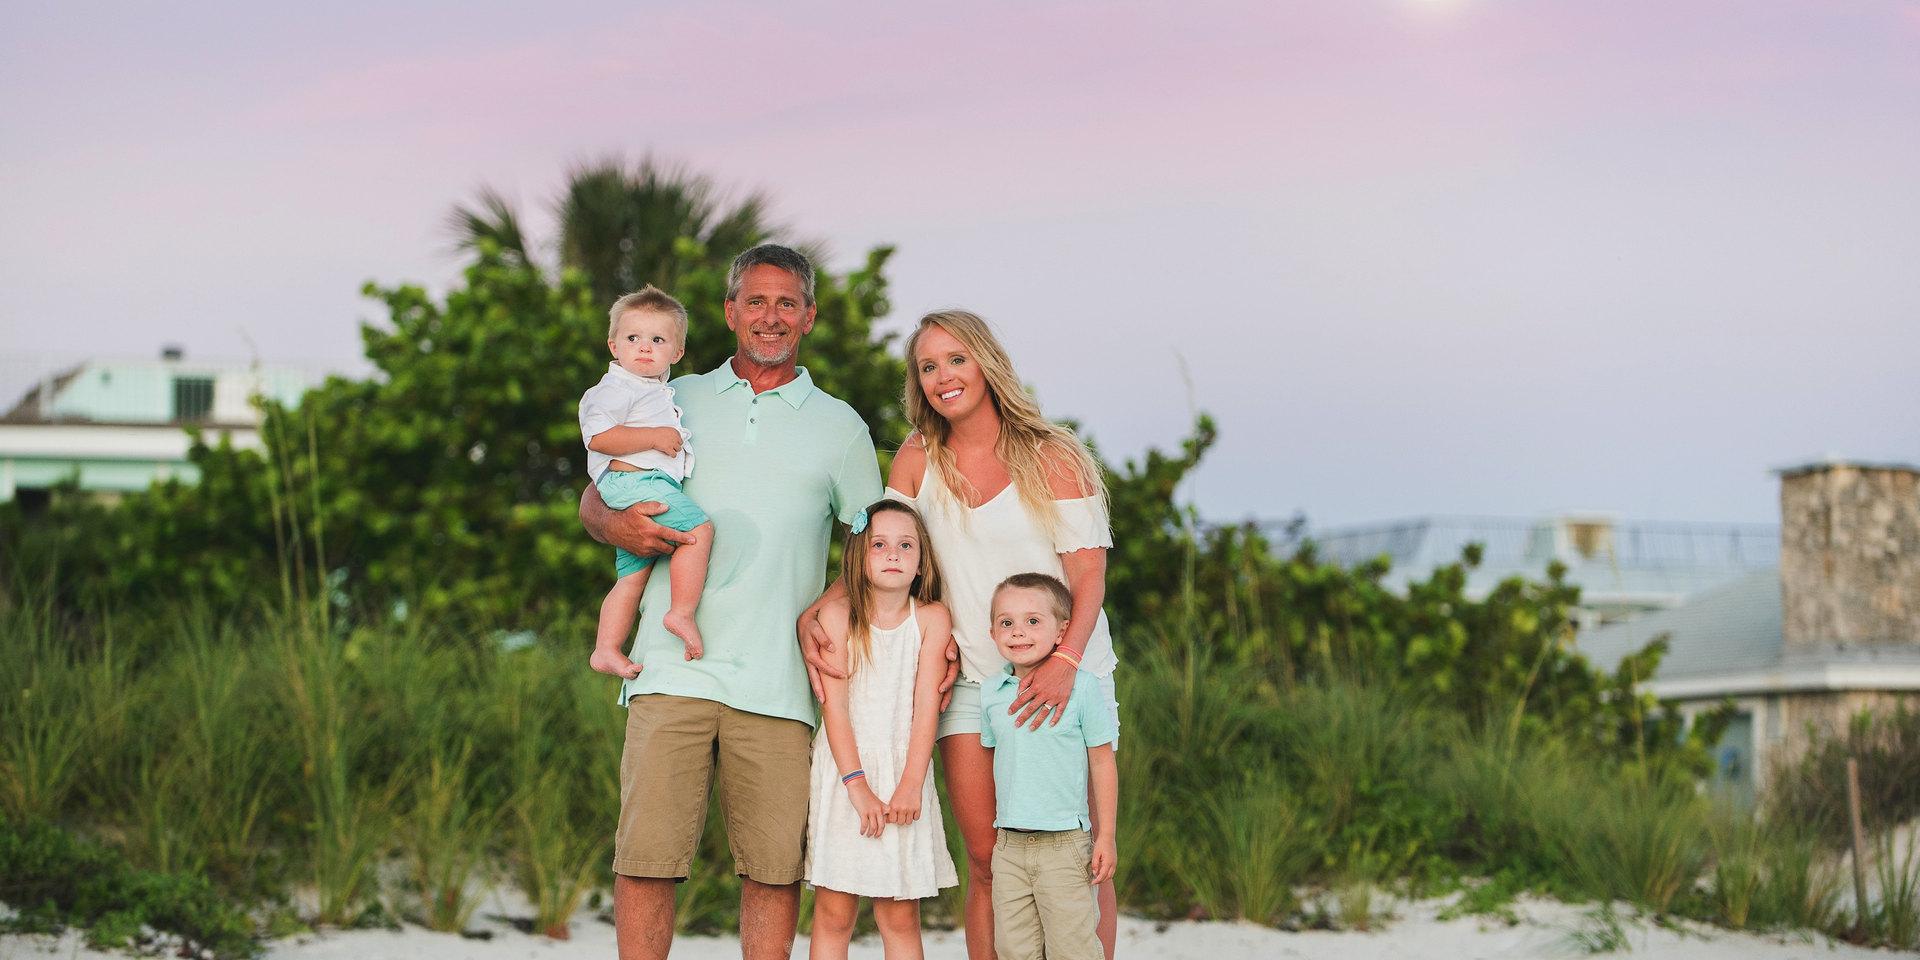 KELIY FAMILY PORTRAIT SESSION